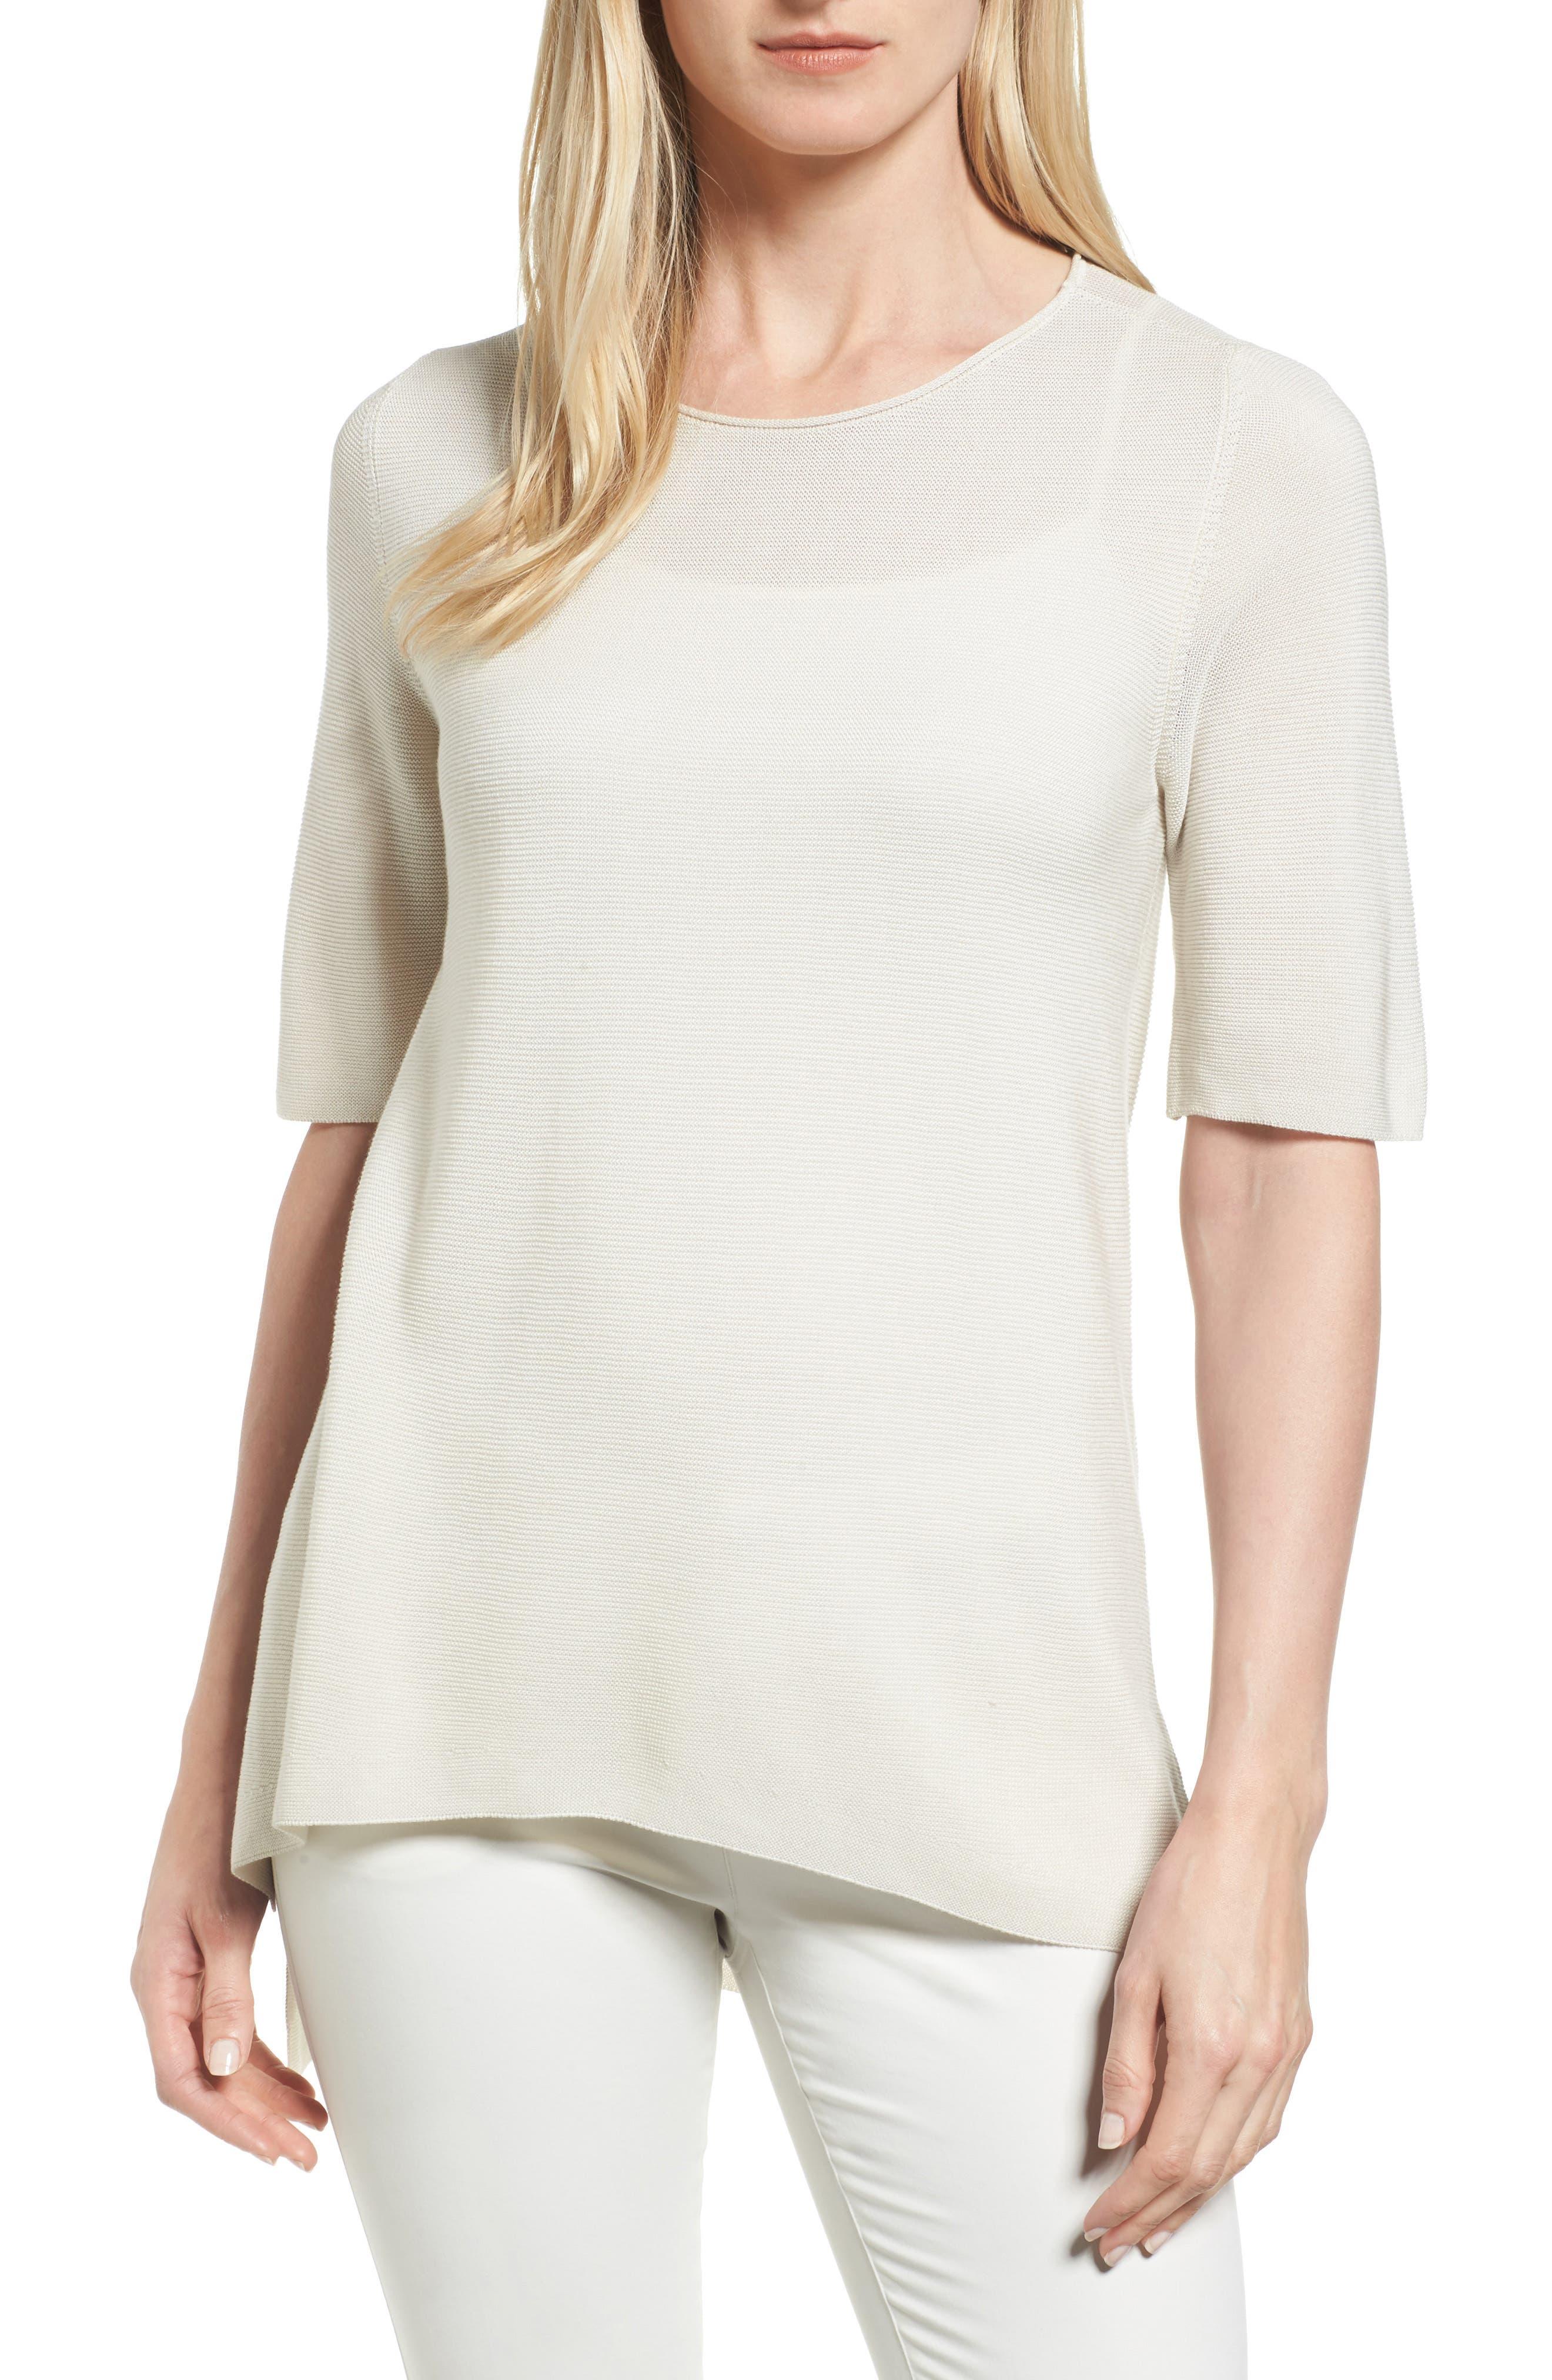 Alternate Image 1 Selected - Eileen Fisher Tencel® Knit Top (Regular & Petite)